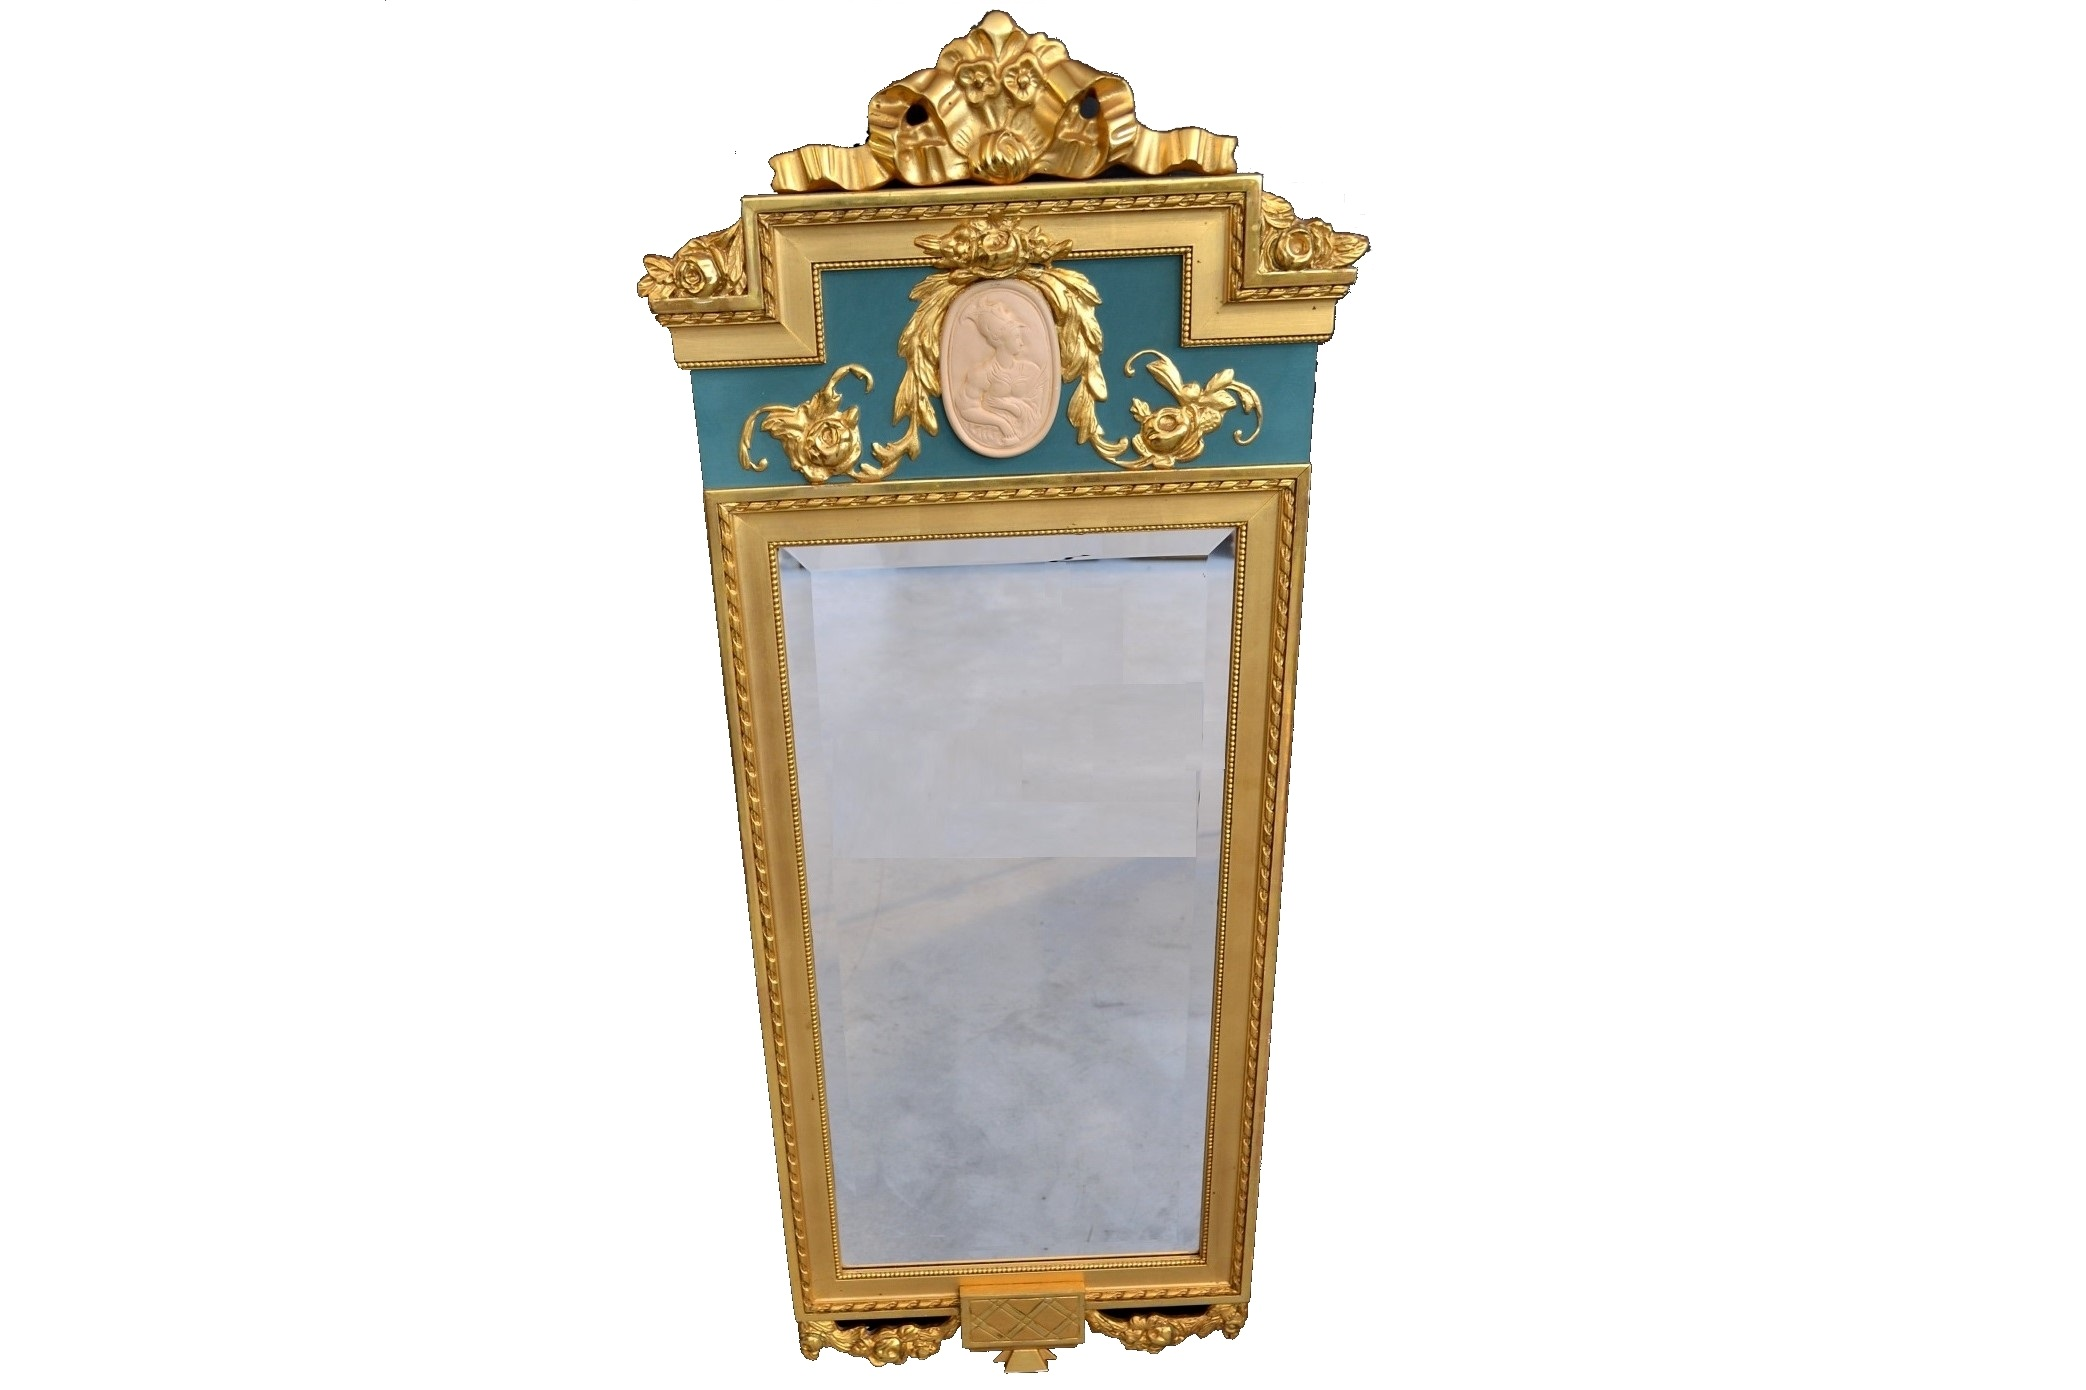 Oglinda stil Louis al XV-lea cu rama din lemn si gips aurit